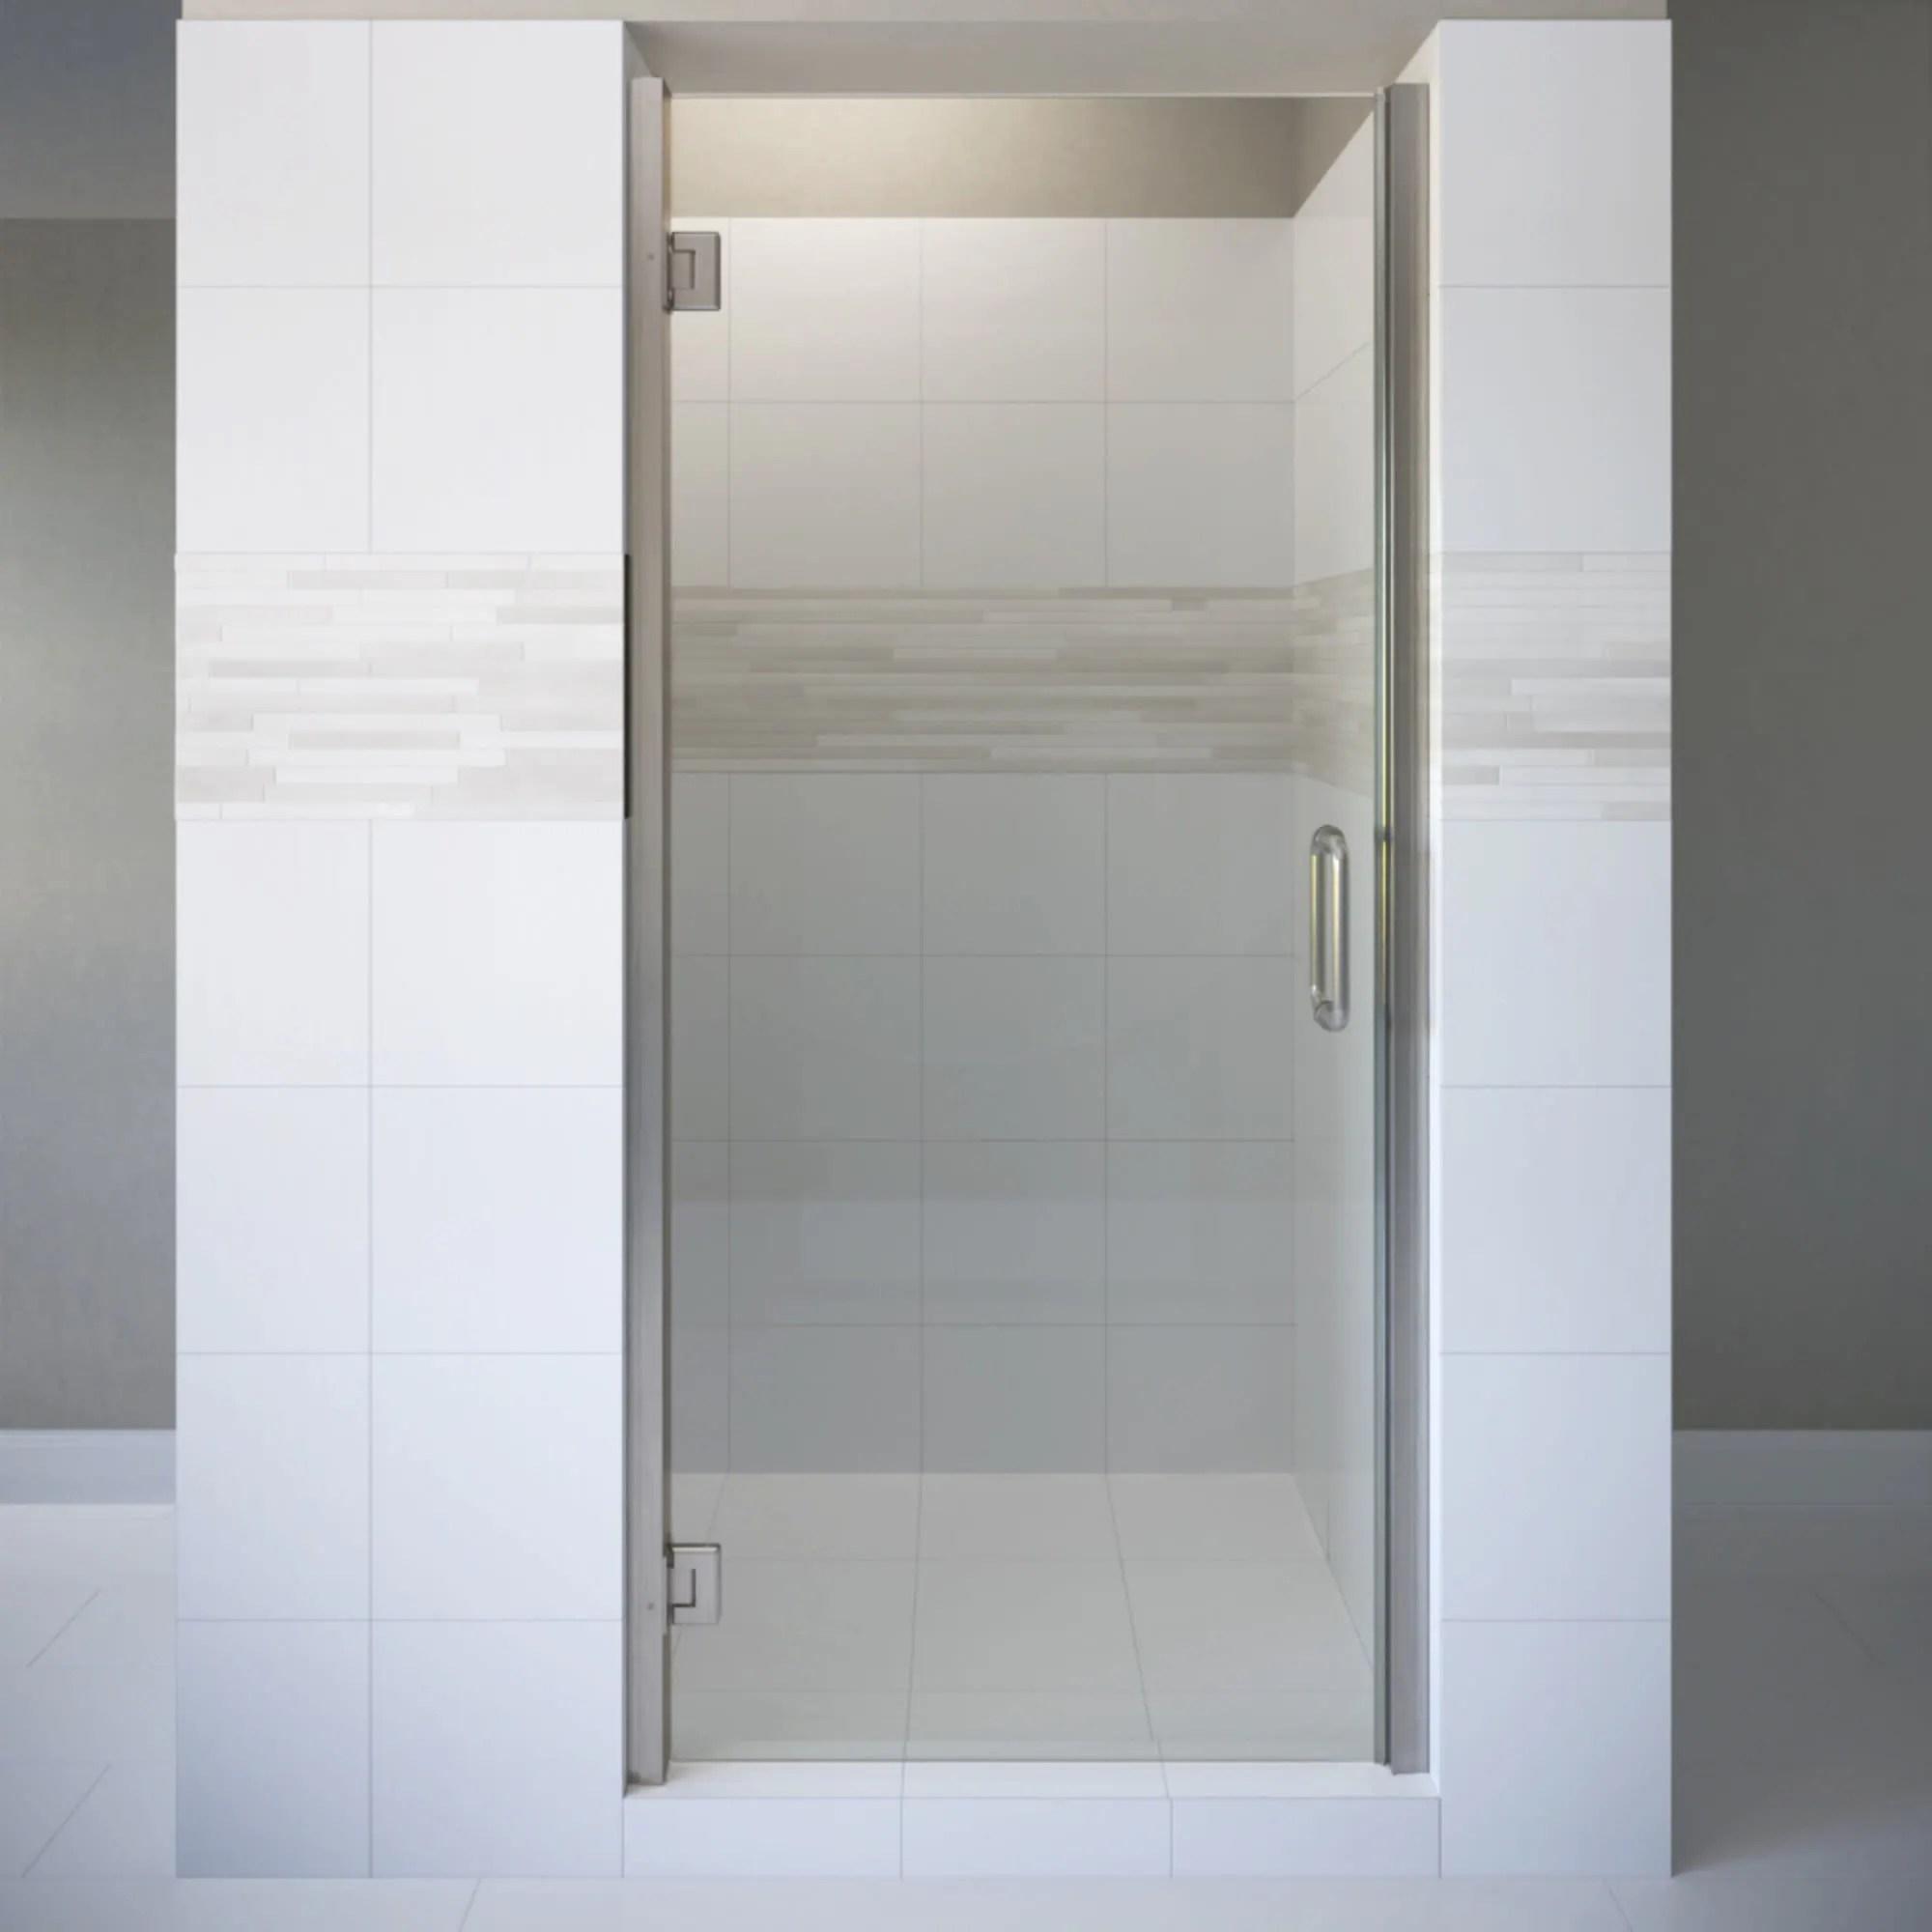 Basco Copa00a2976xp Coppia 76 High X 29 9 16 Wide Hinged Frameless Shower Door